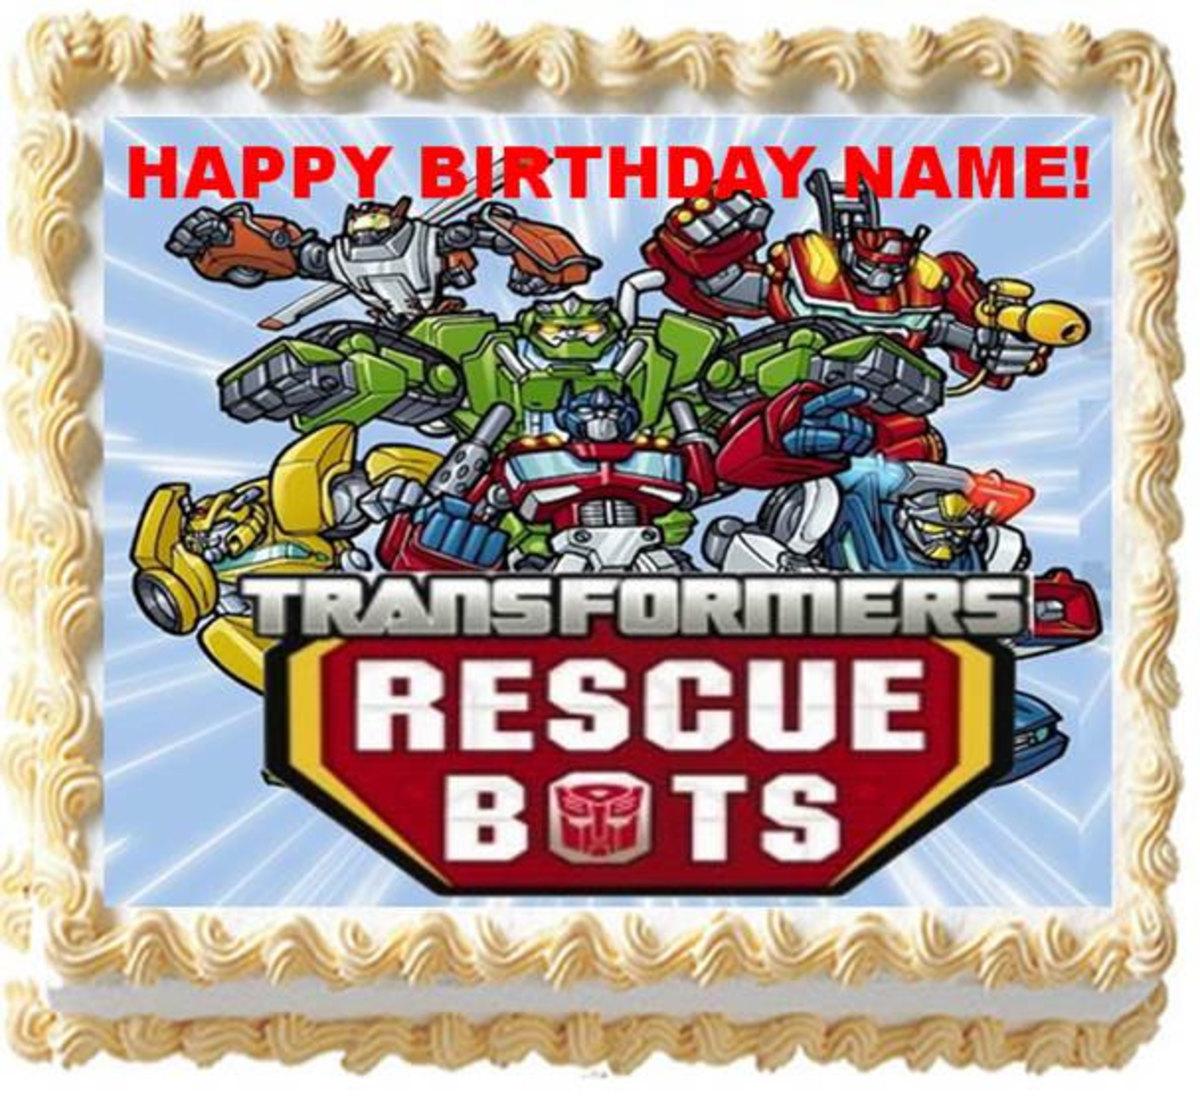 Plan A Transformers Rescue Bots Birthday Party Theme